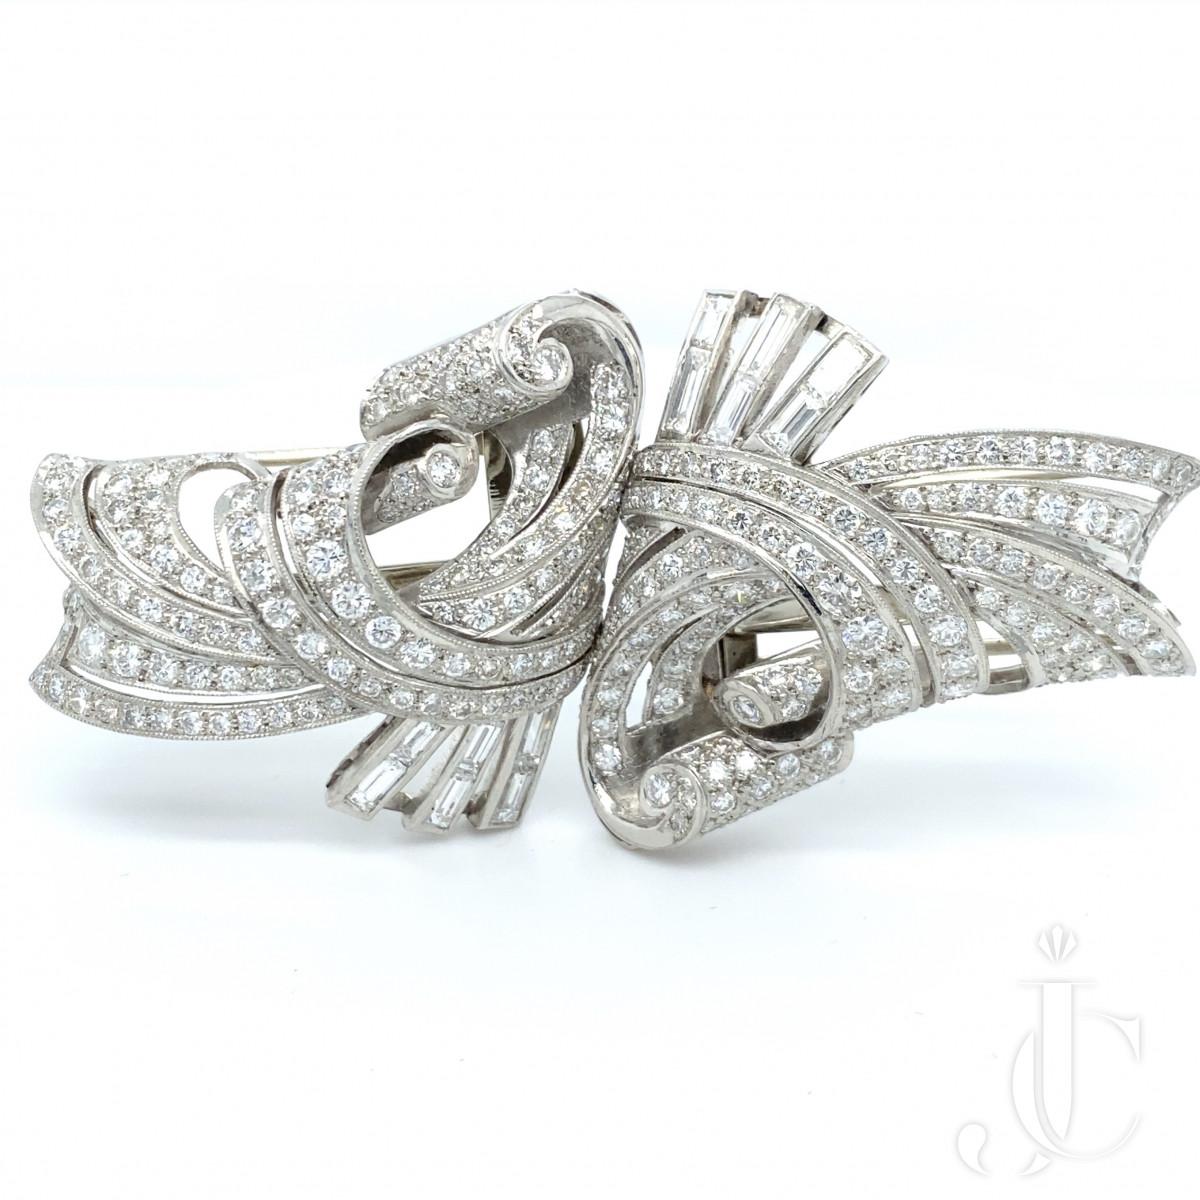 Pair of platinum diamond clips